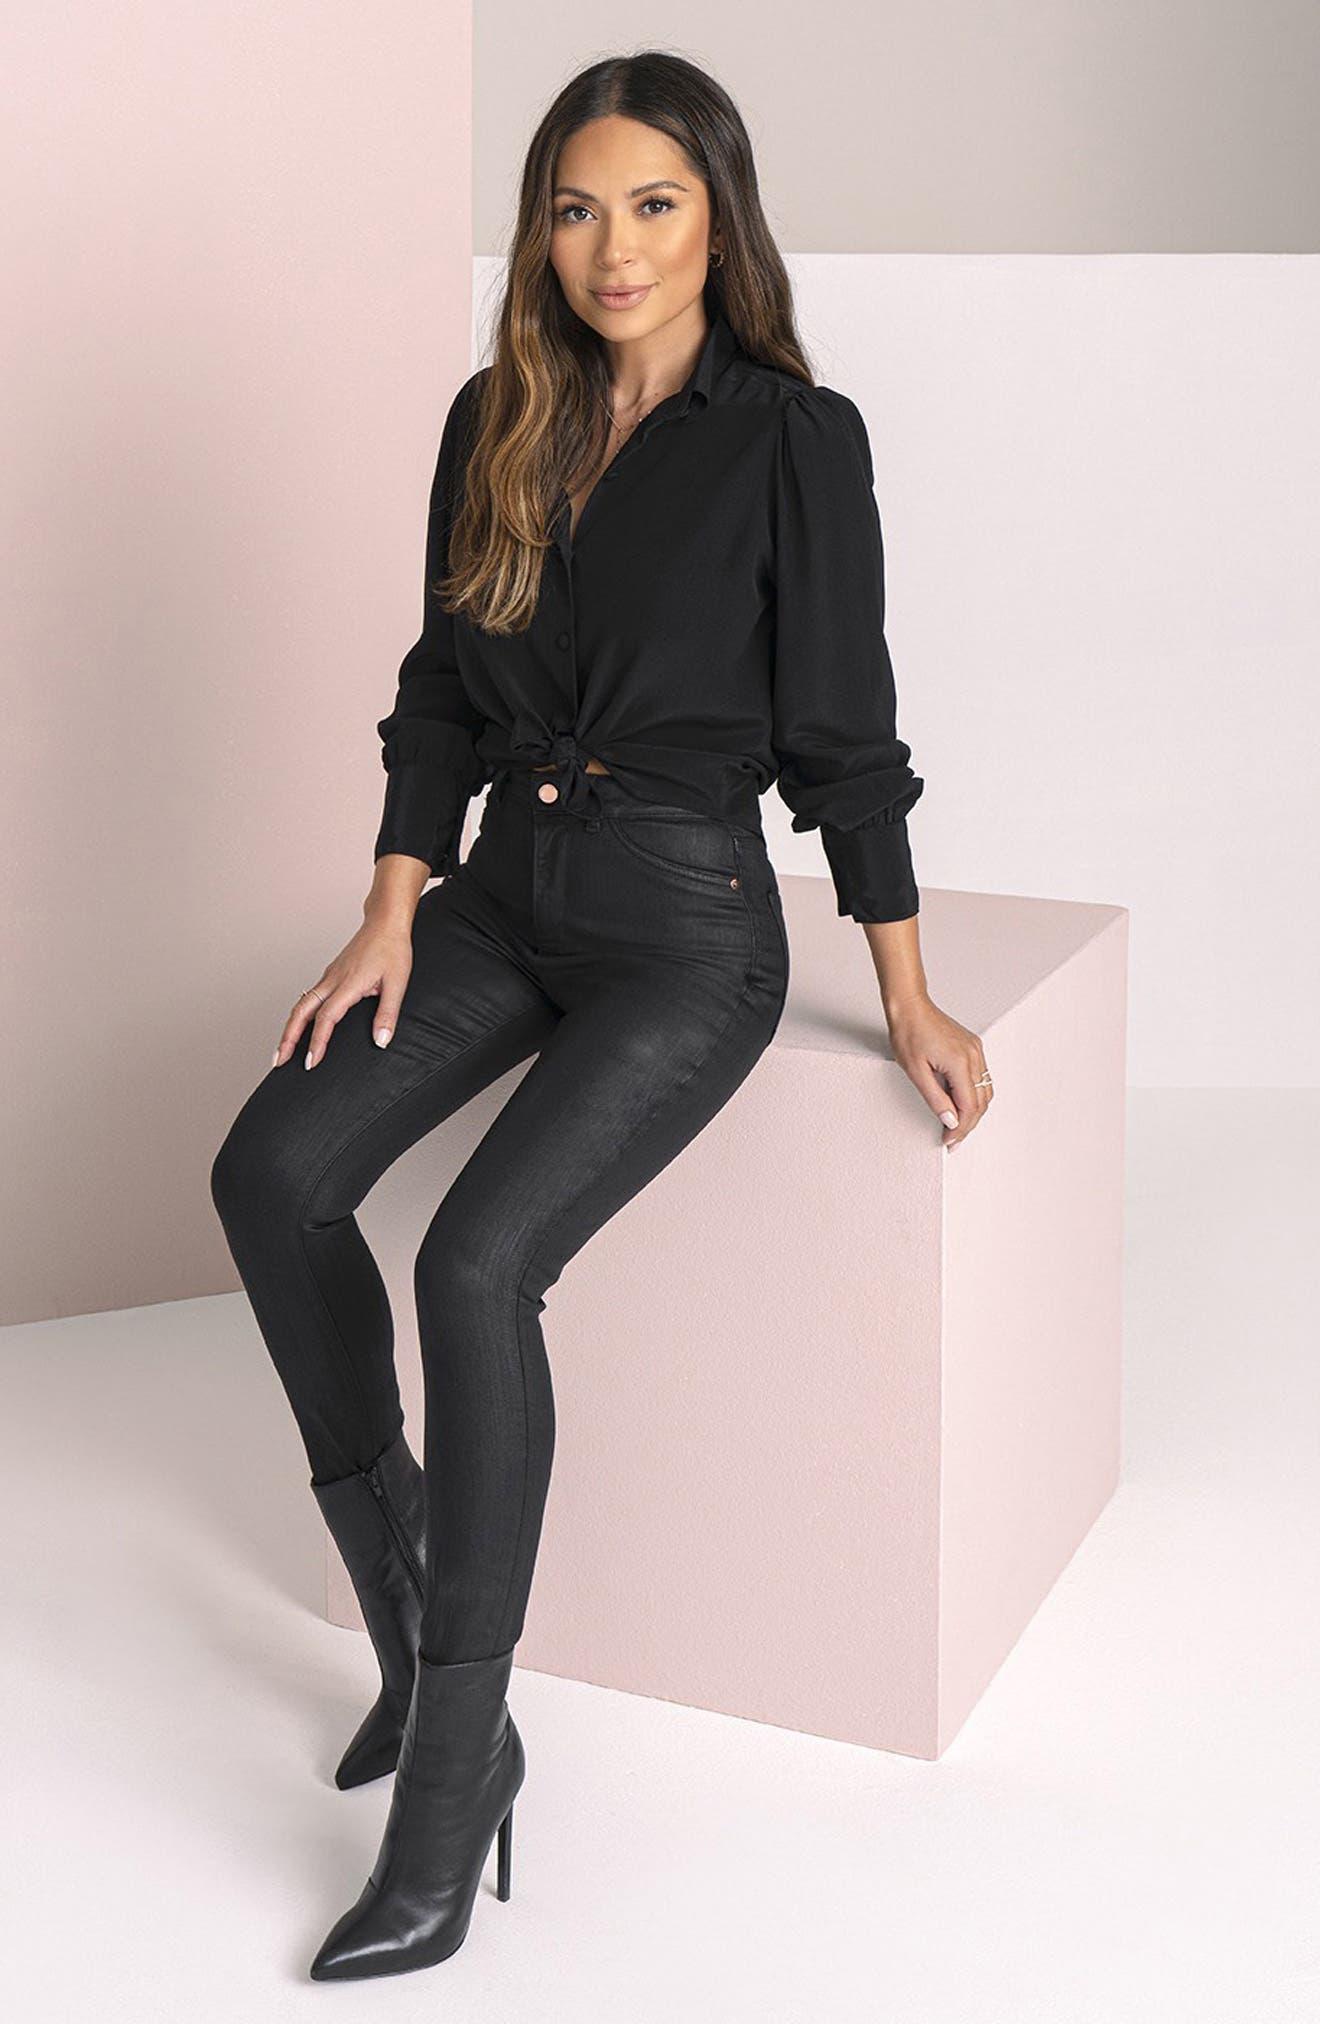 DL1961 x Marianna Hewitt Instasculpt Farrow High Waist Ankle Coated Skinny Jeans (Sonoma)